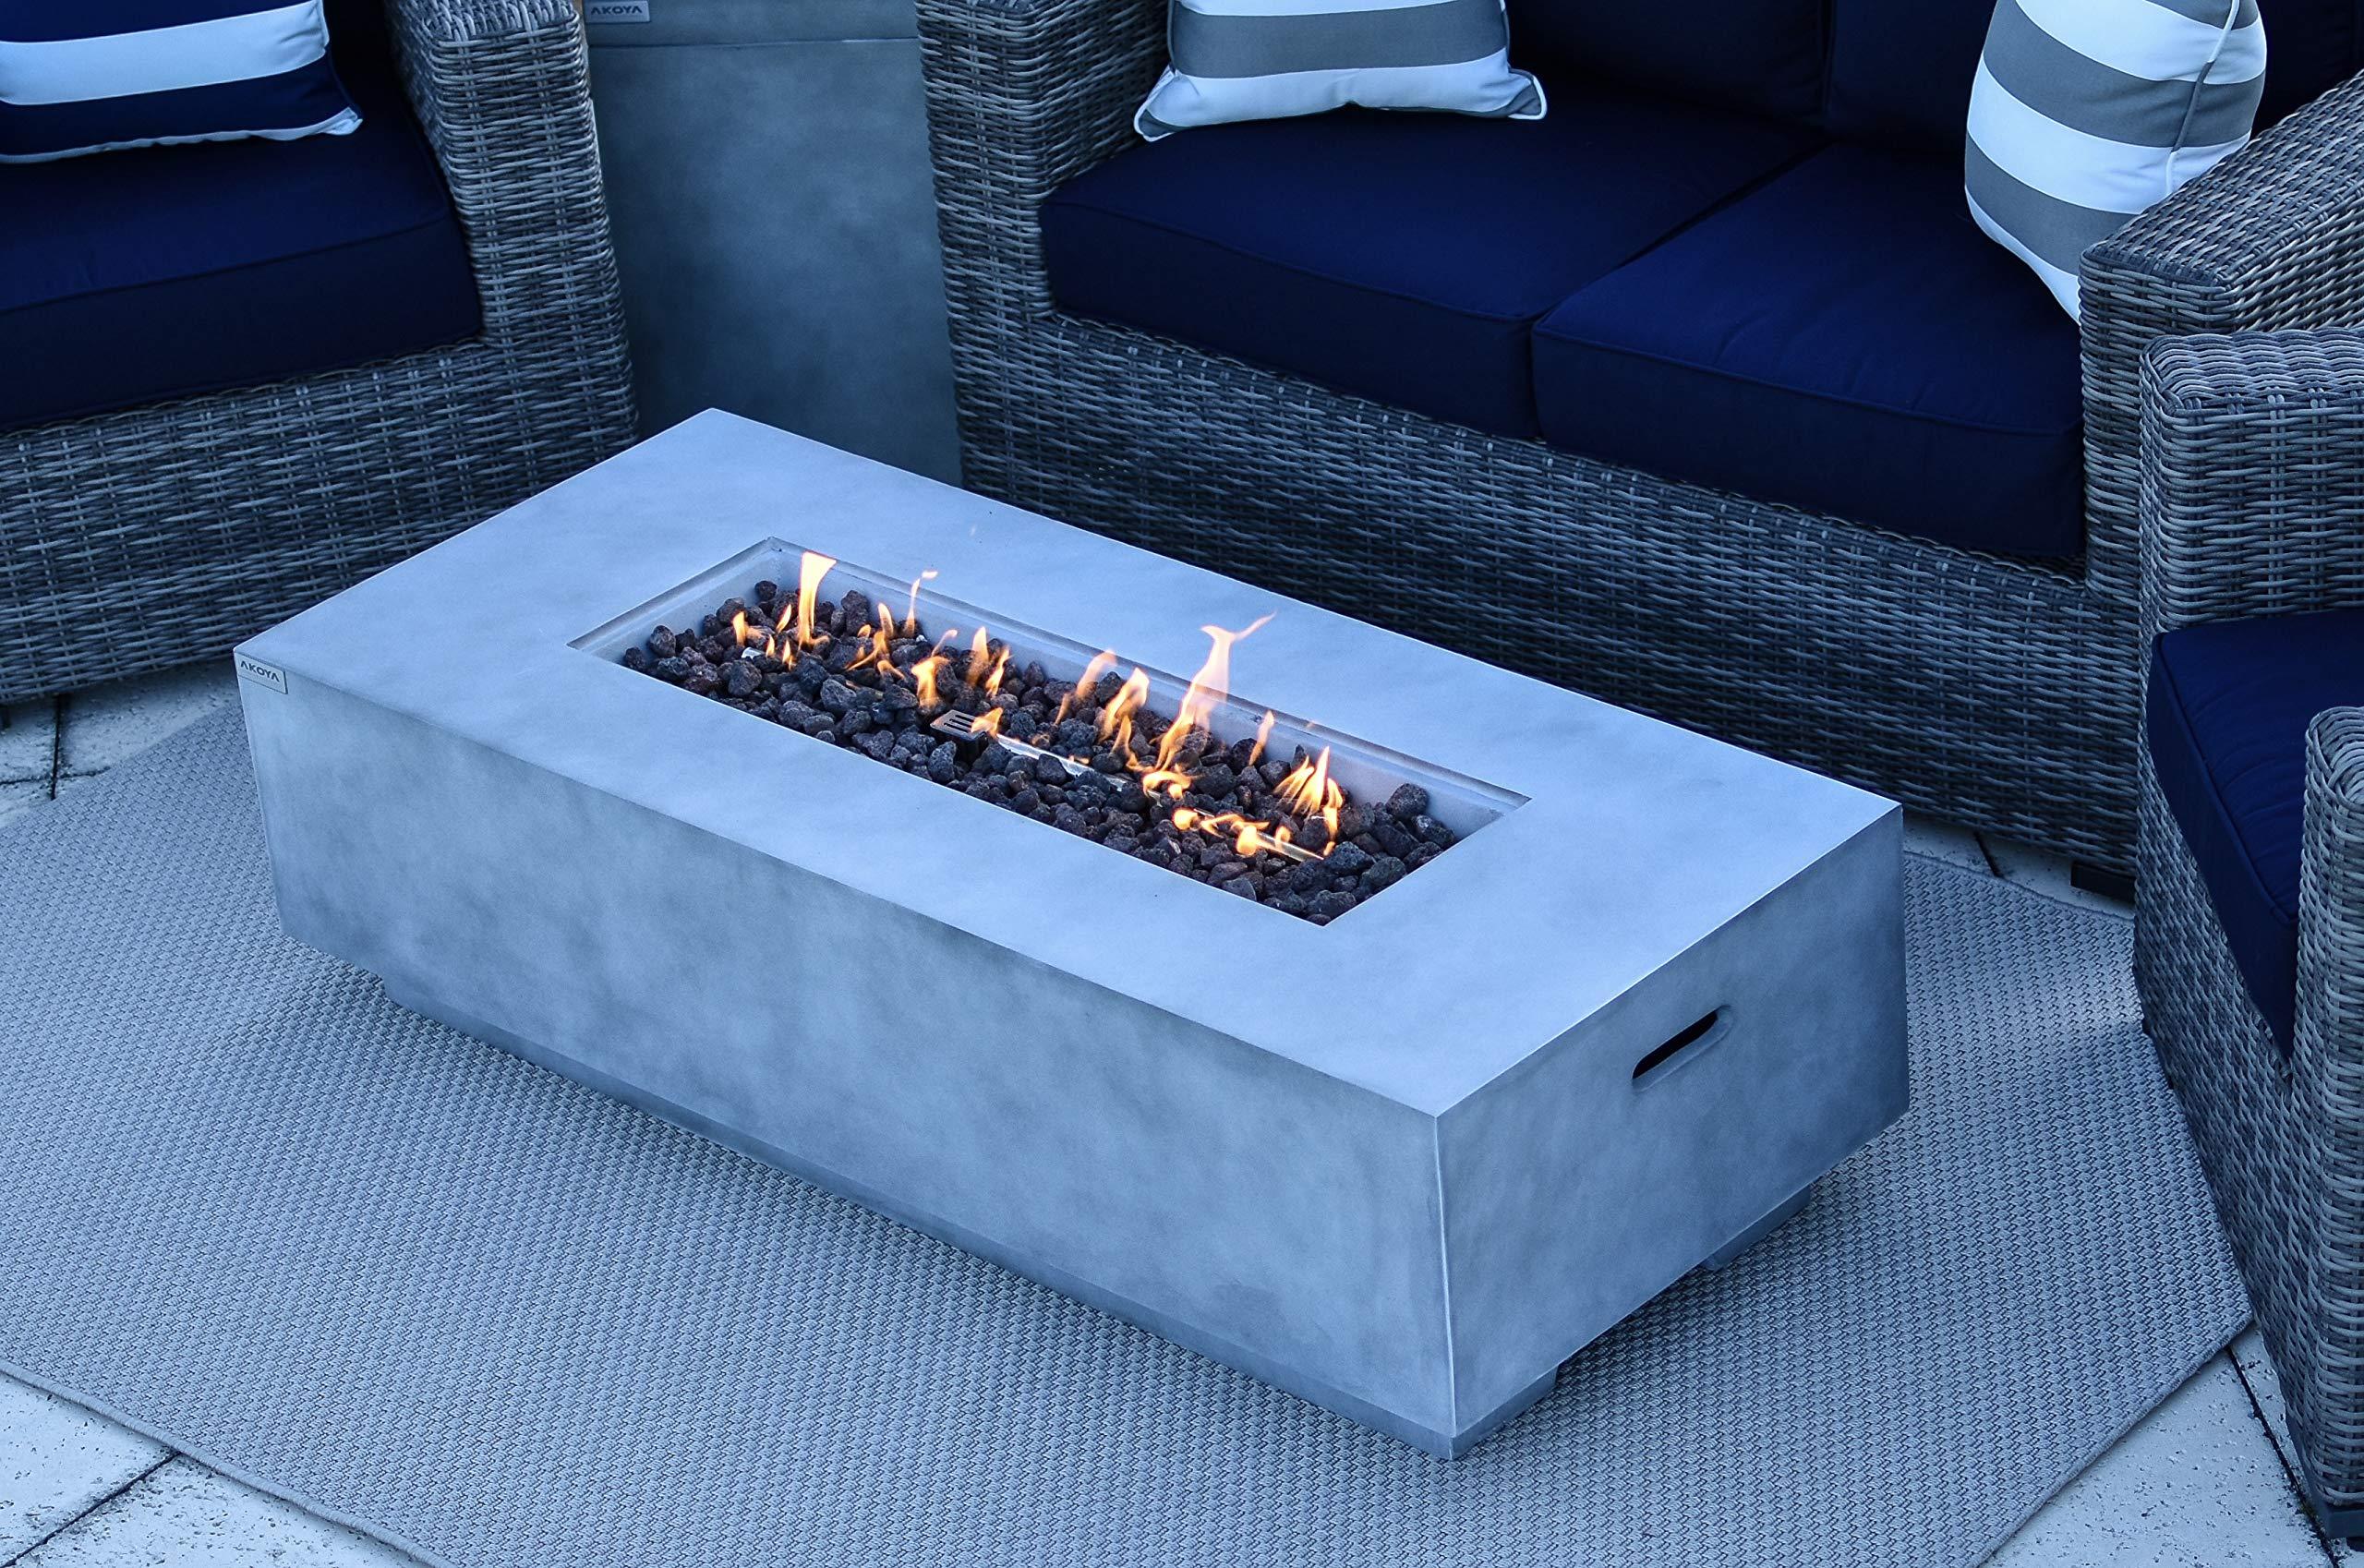 AKOYA Outdoor Essentials 56'' Fiber Concrete Rectangular Outdoor Propane Gas Fire Pit Table in Gray by AKOYA Outdoor Essentials